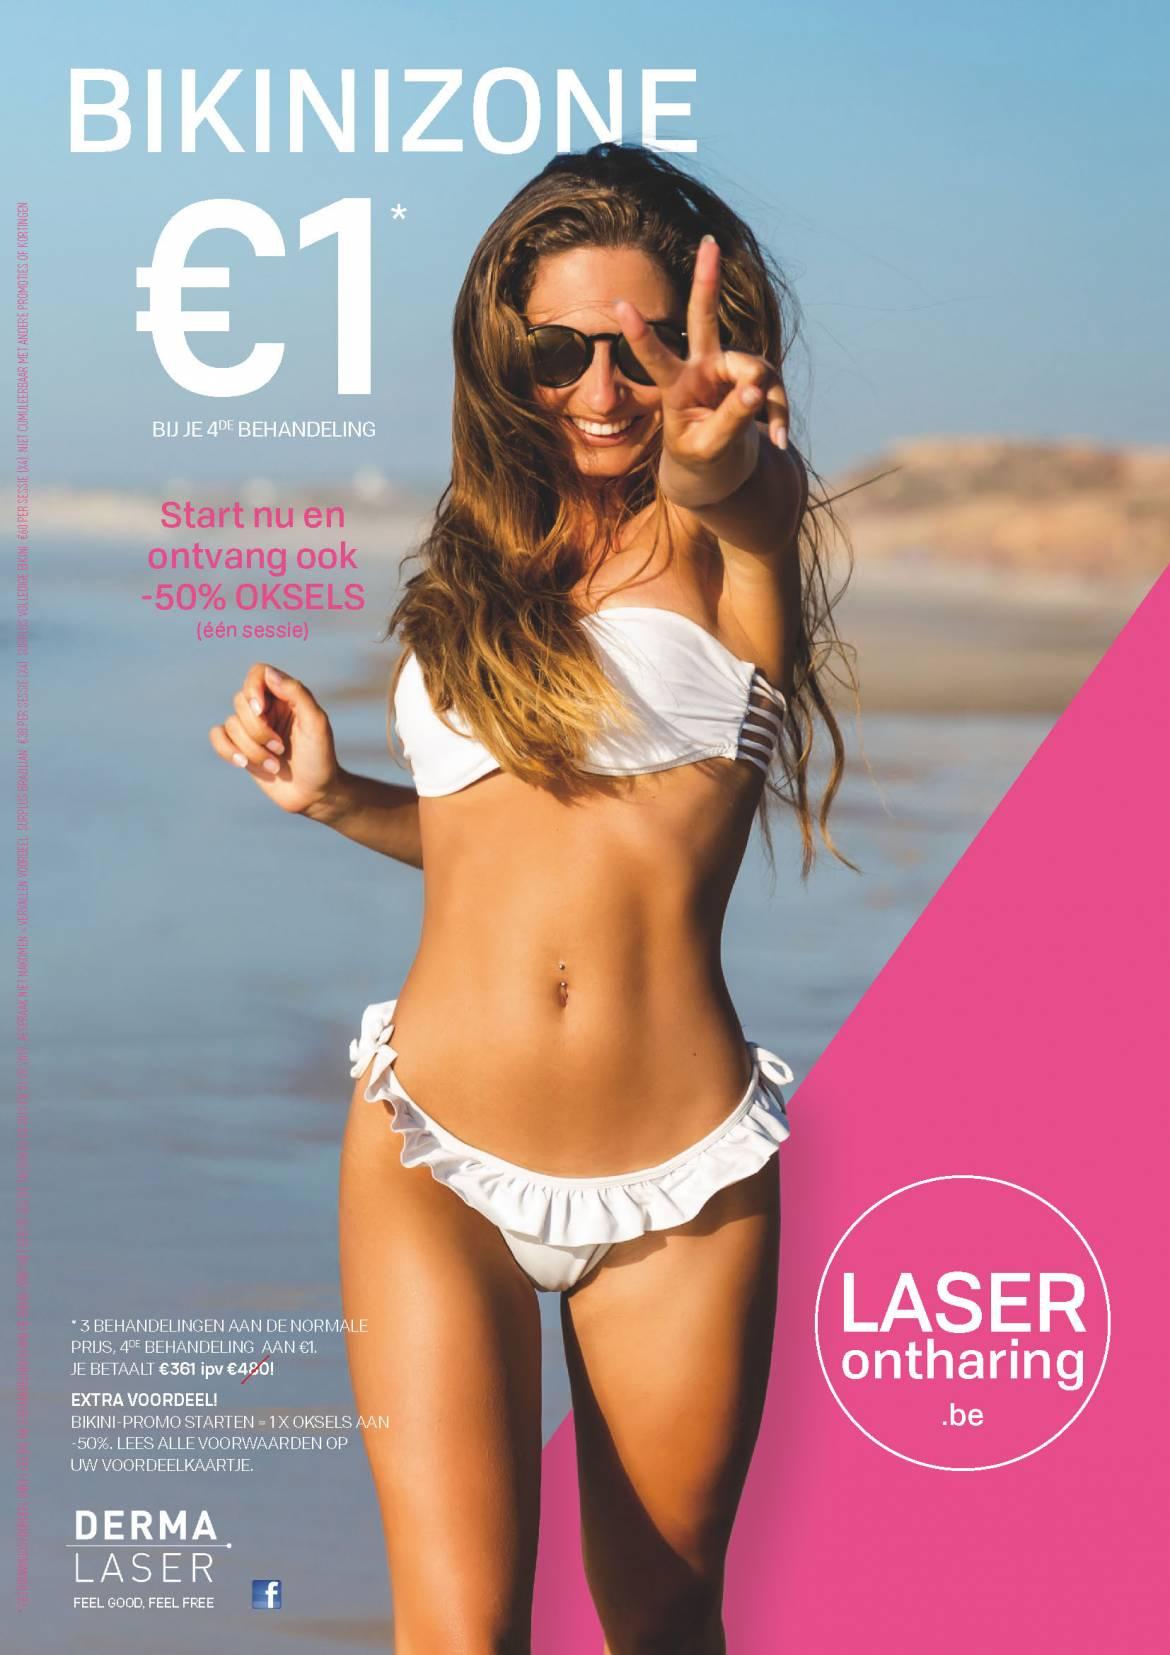 Definitieve ontharing / laser